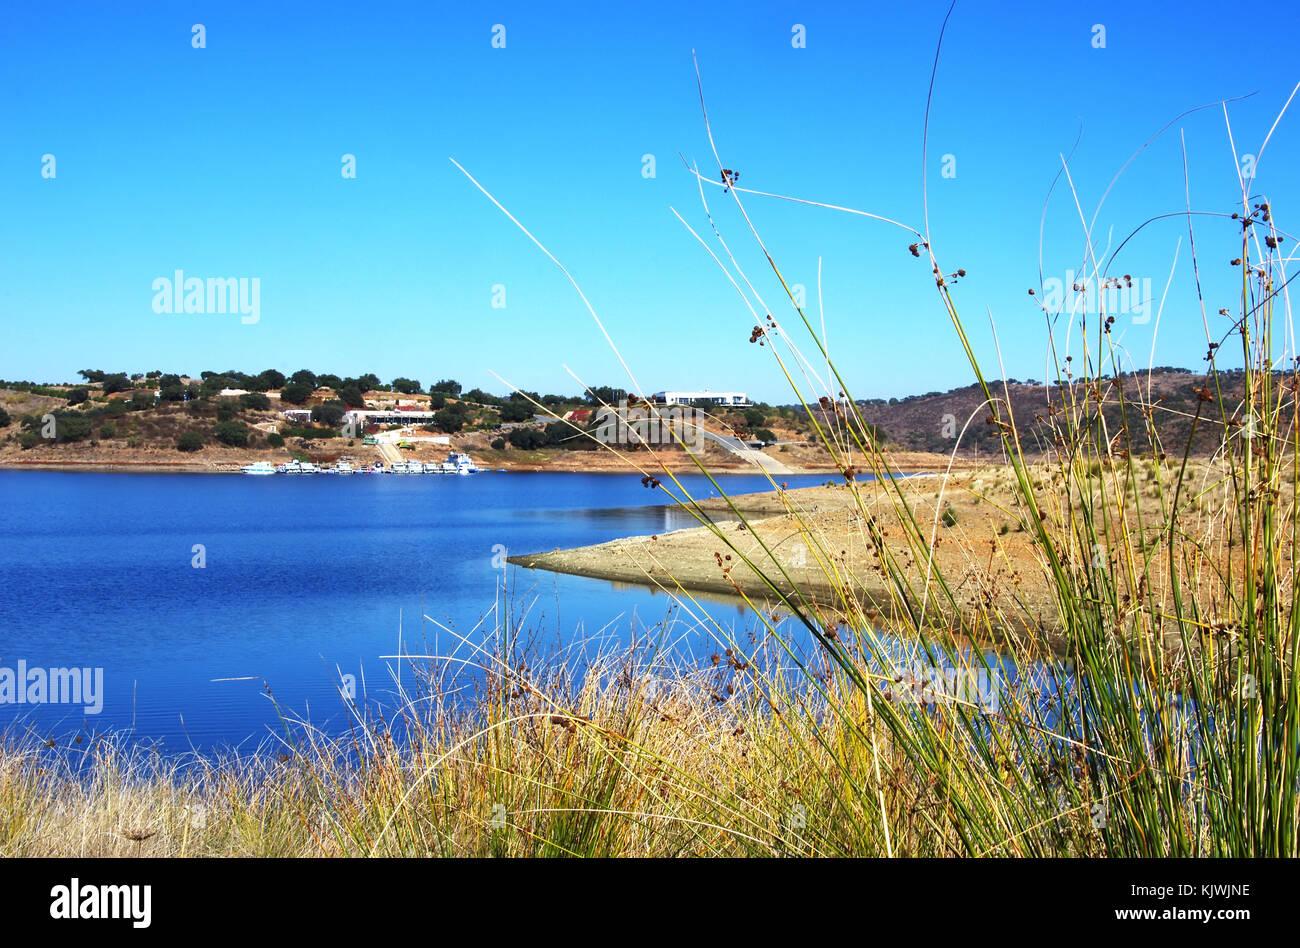 Landscape of Amieira marina, Alentejo, Portugal Stock Photo